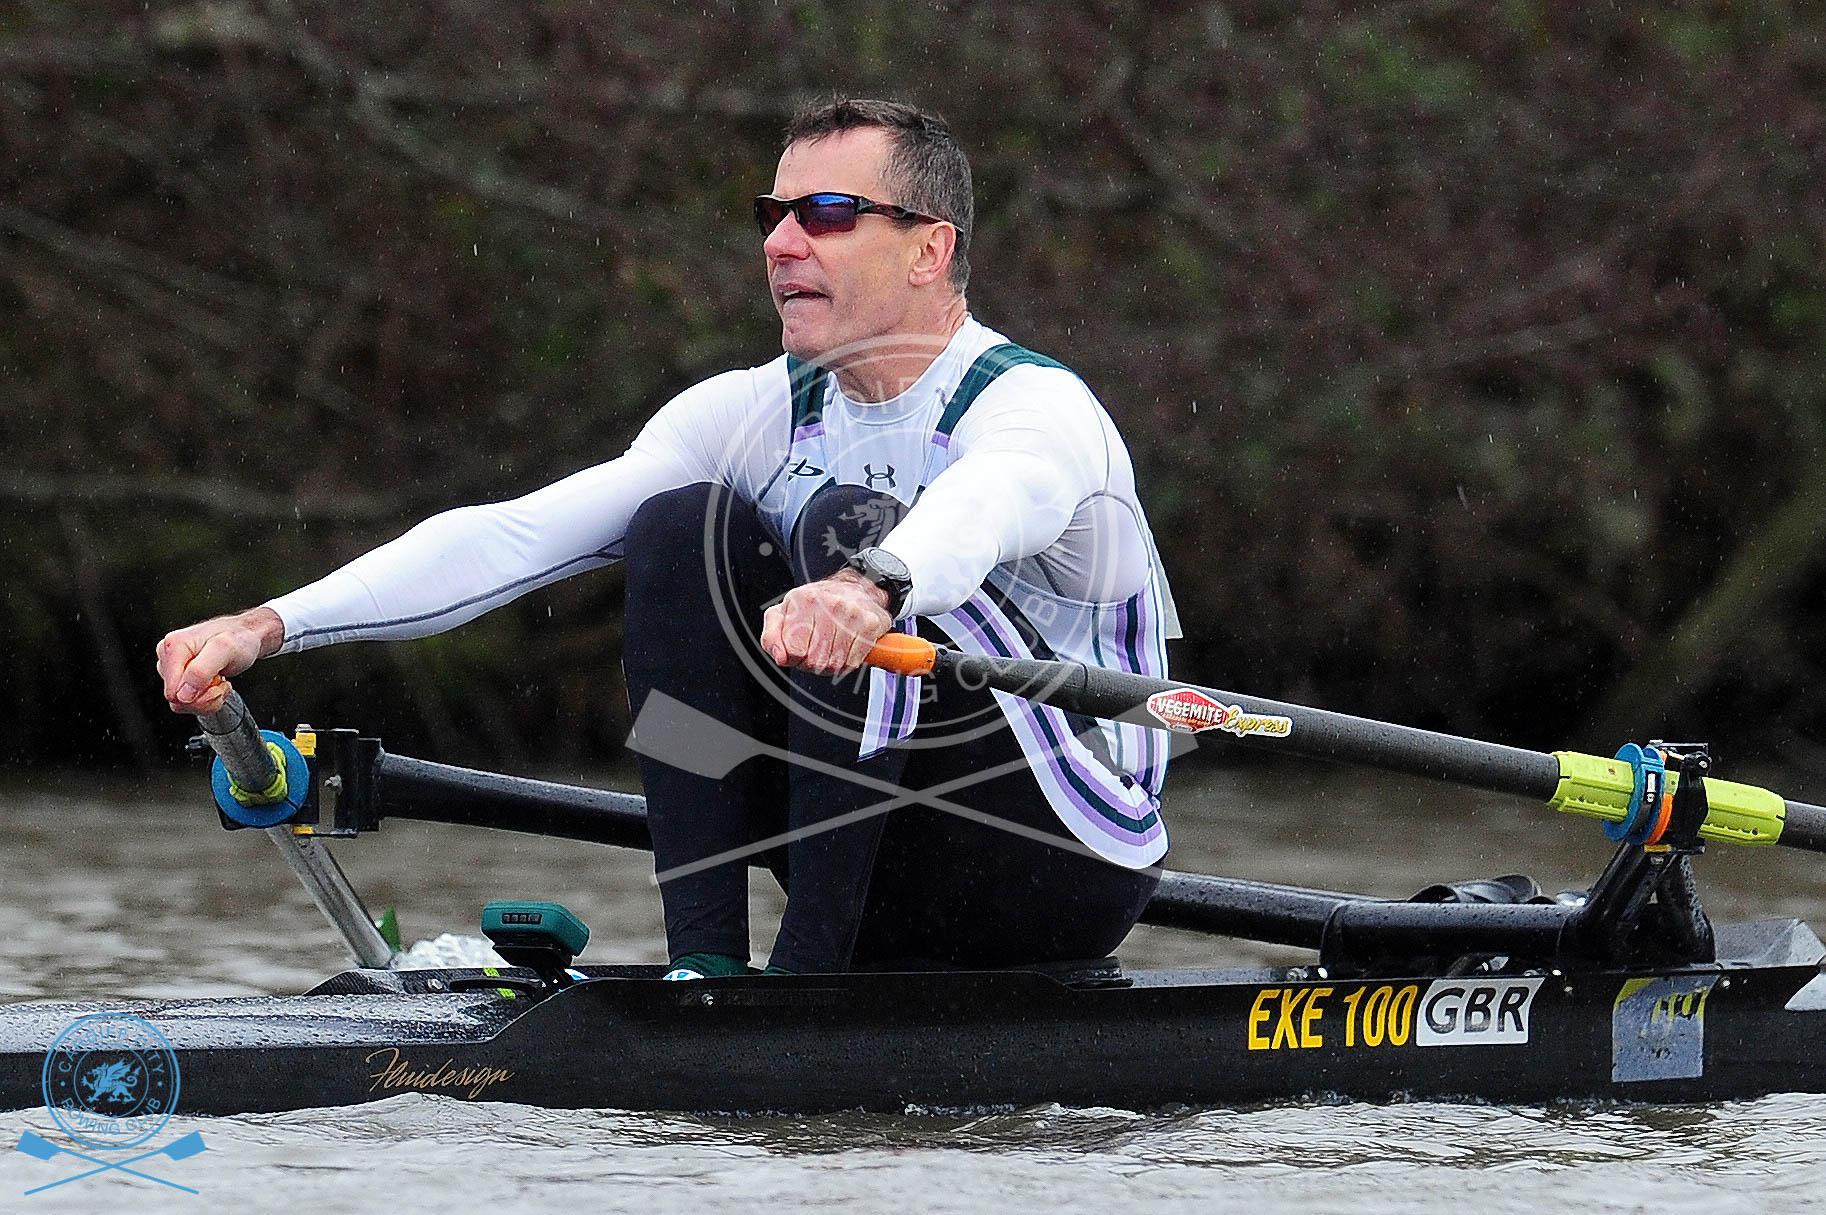 DW_280119_Cardiff_City_Rowing_295.jpg